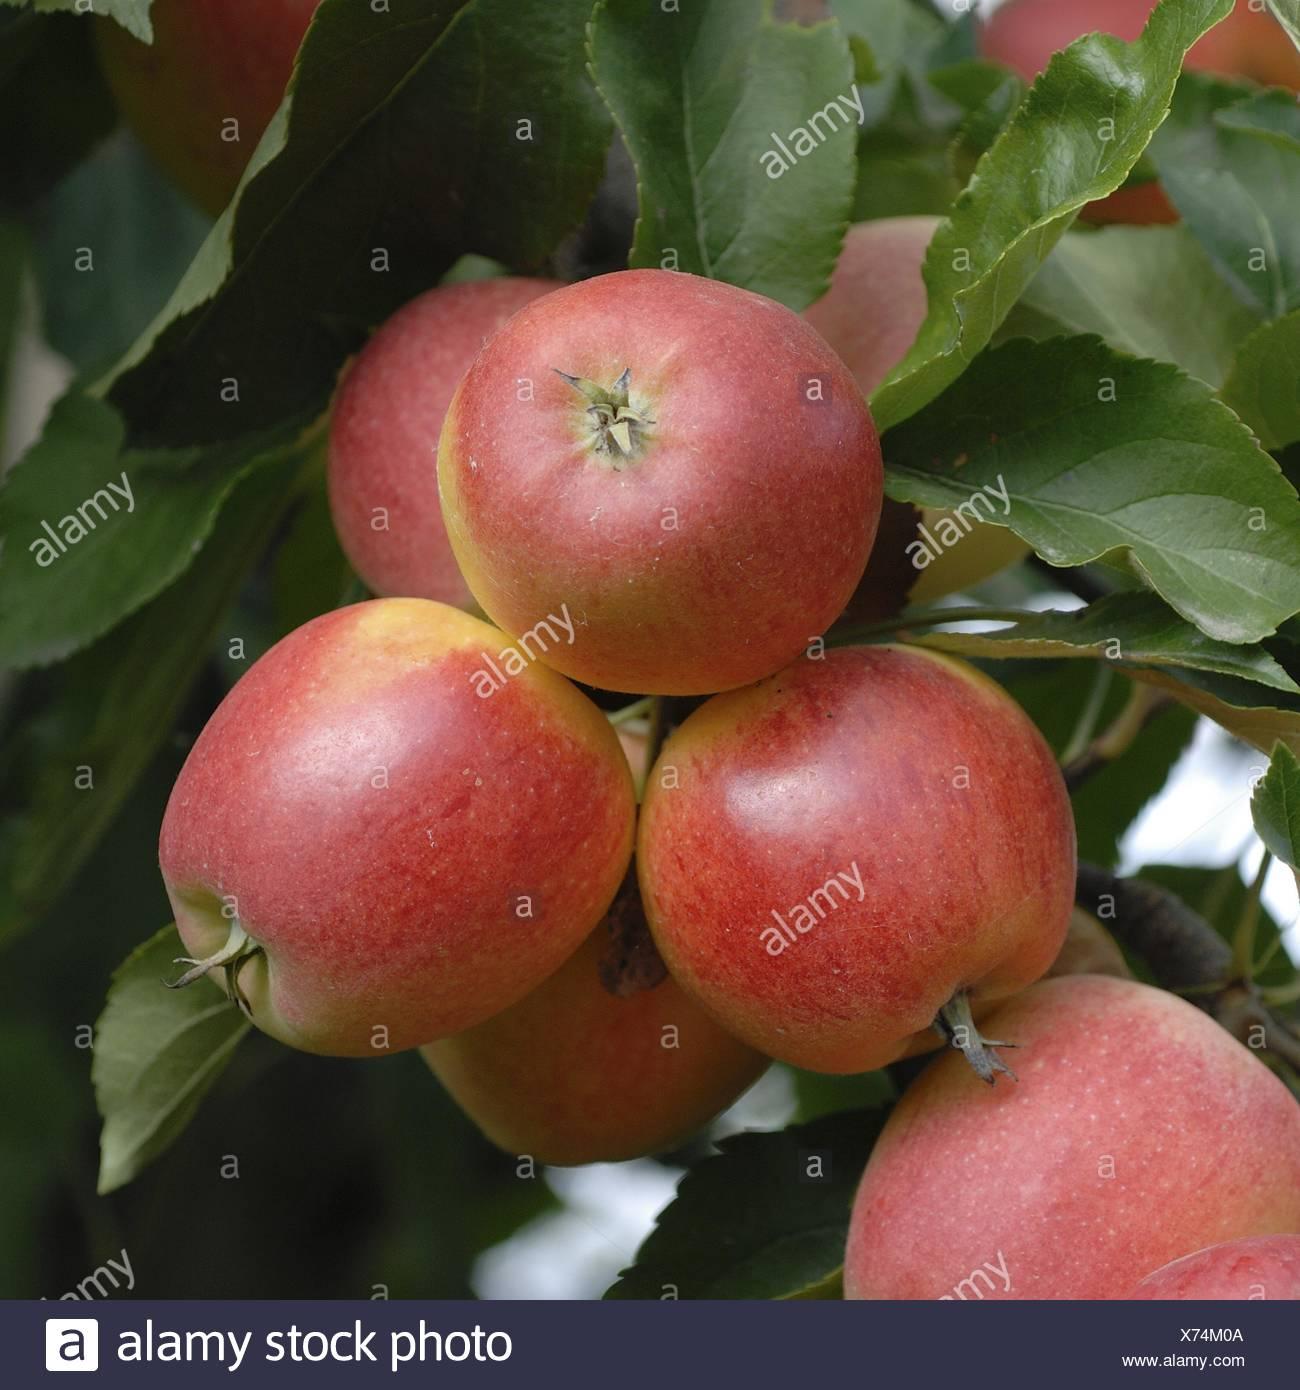 apple tree (Malus domestica 'Gala', Malus domestica Gala), cultivar Gala, apples on a tree - Stock Image